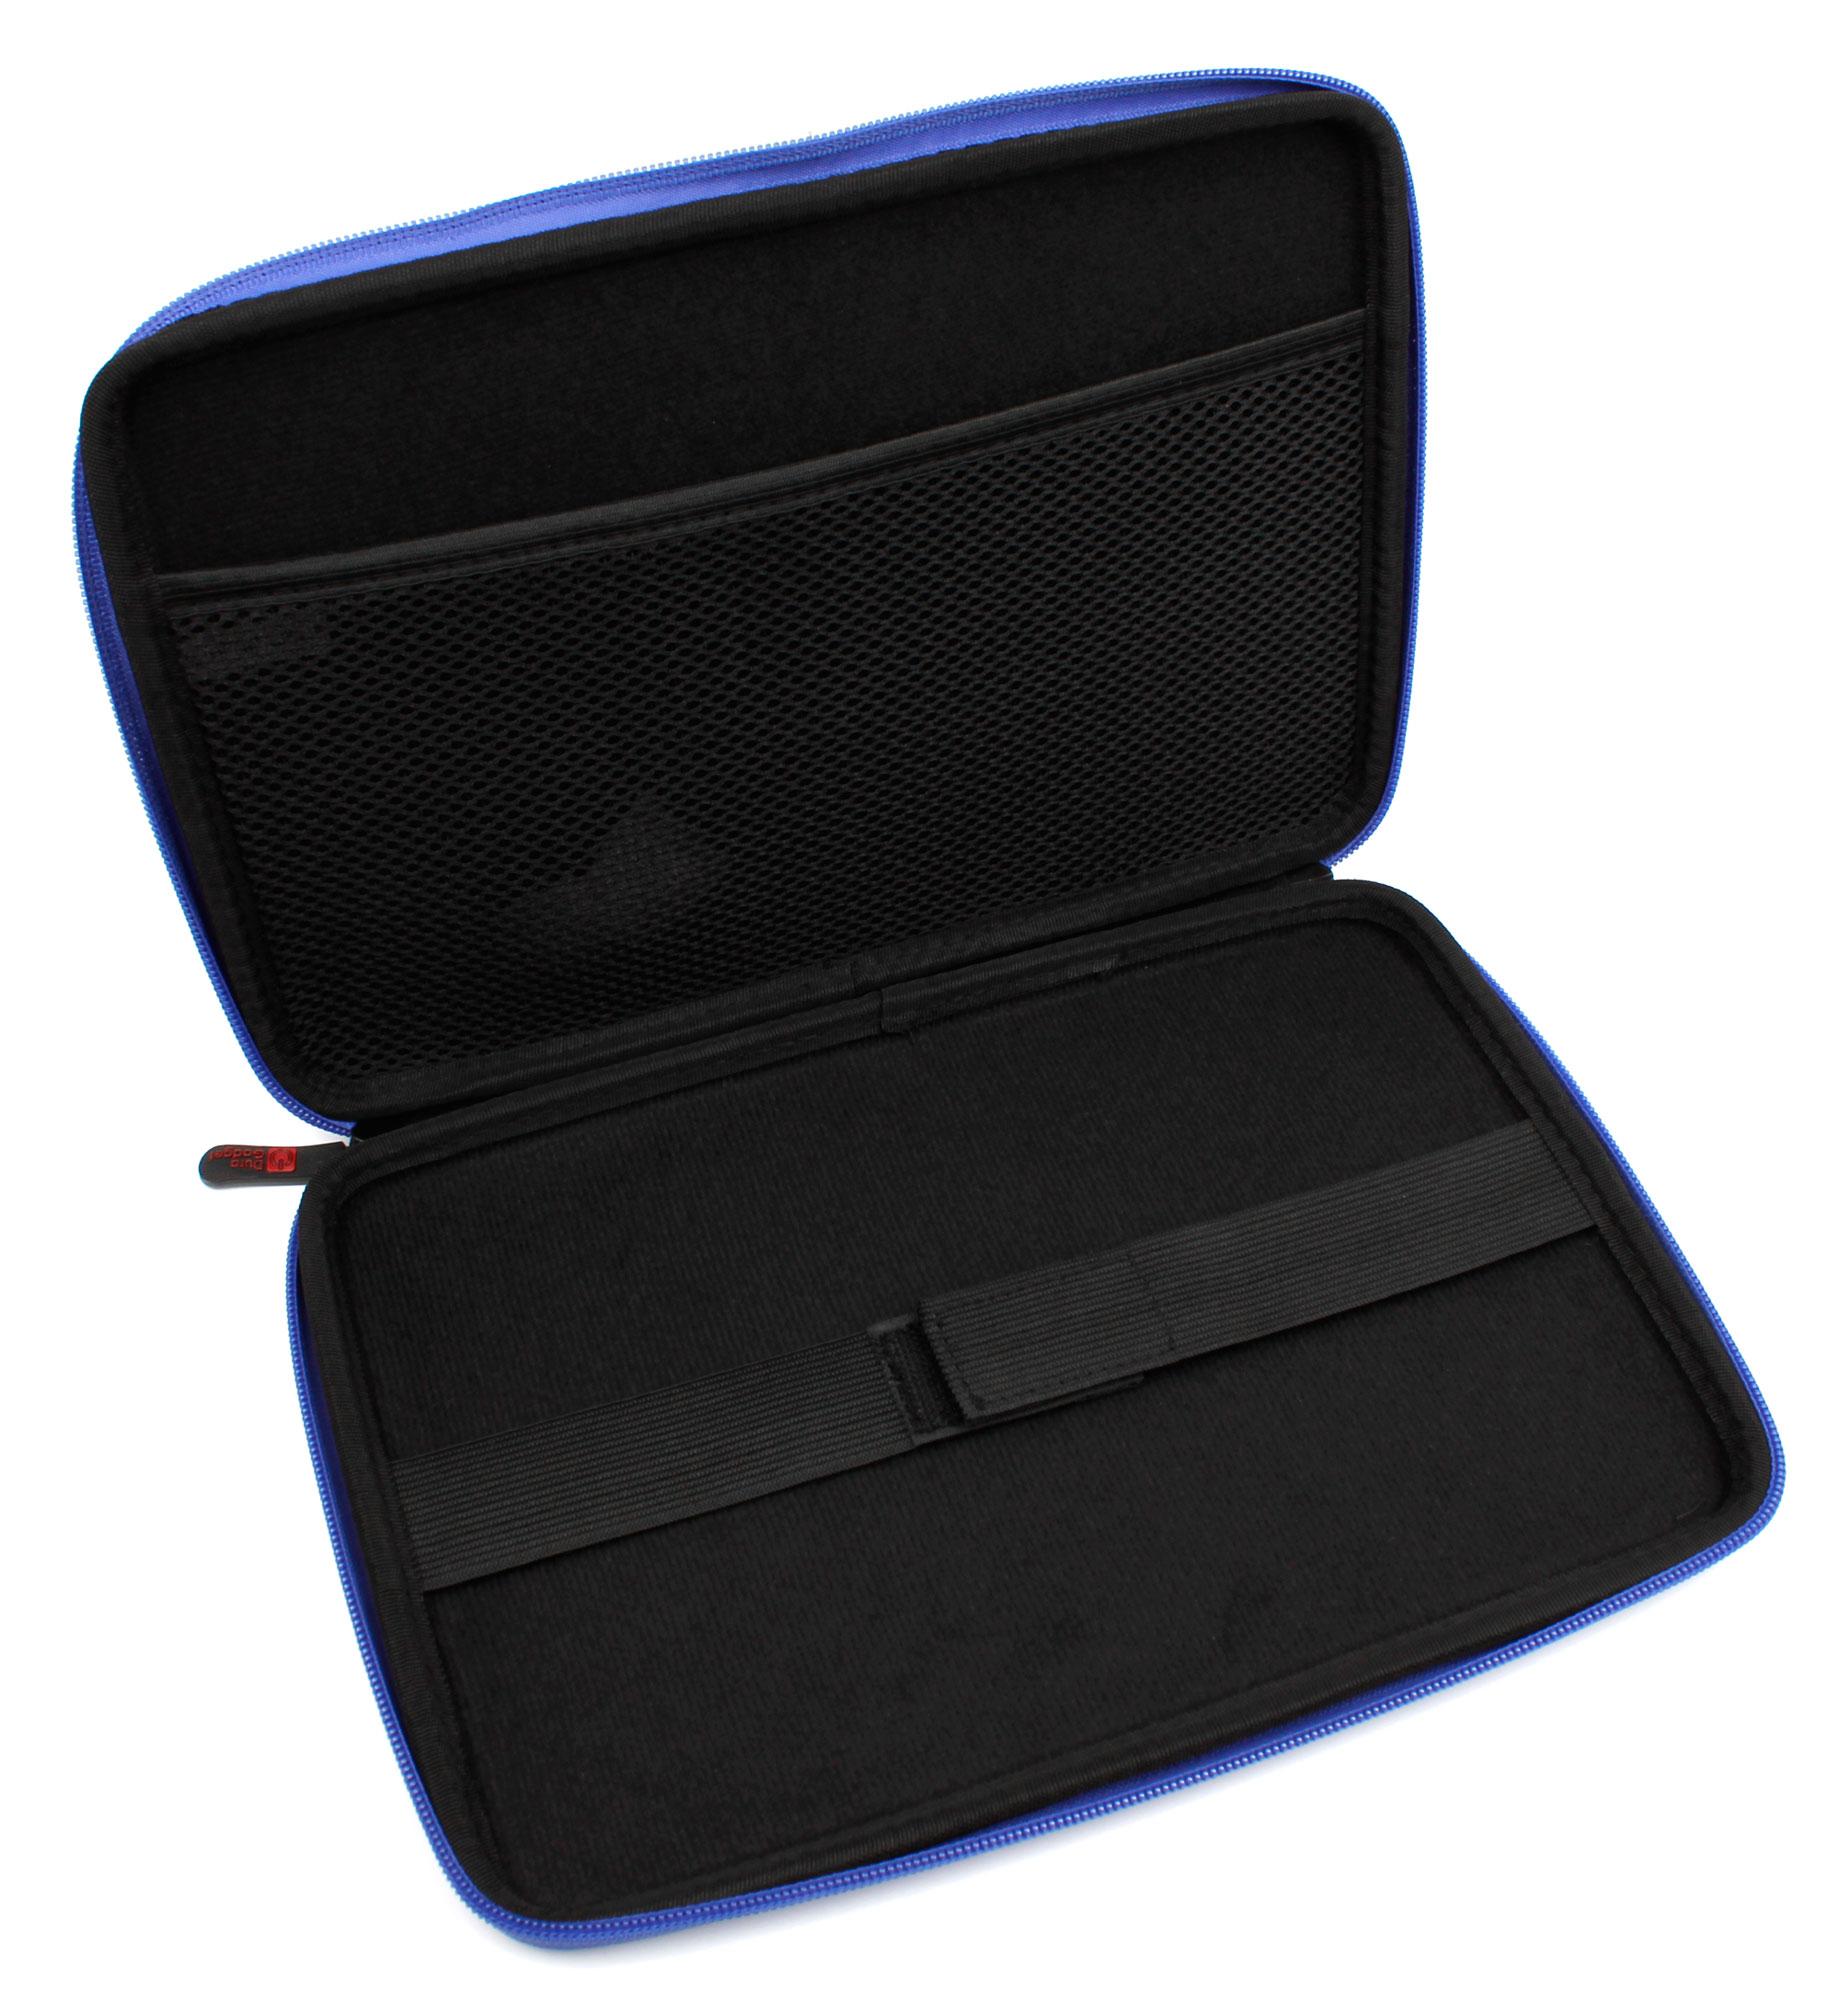 tui rigide bleu pour tablette samsung galaxy tab s 10 5 sm t800 sm t805 ebay. Black Bedroom Furniture Sets. Home Design Ideas